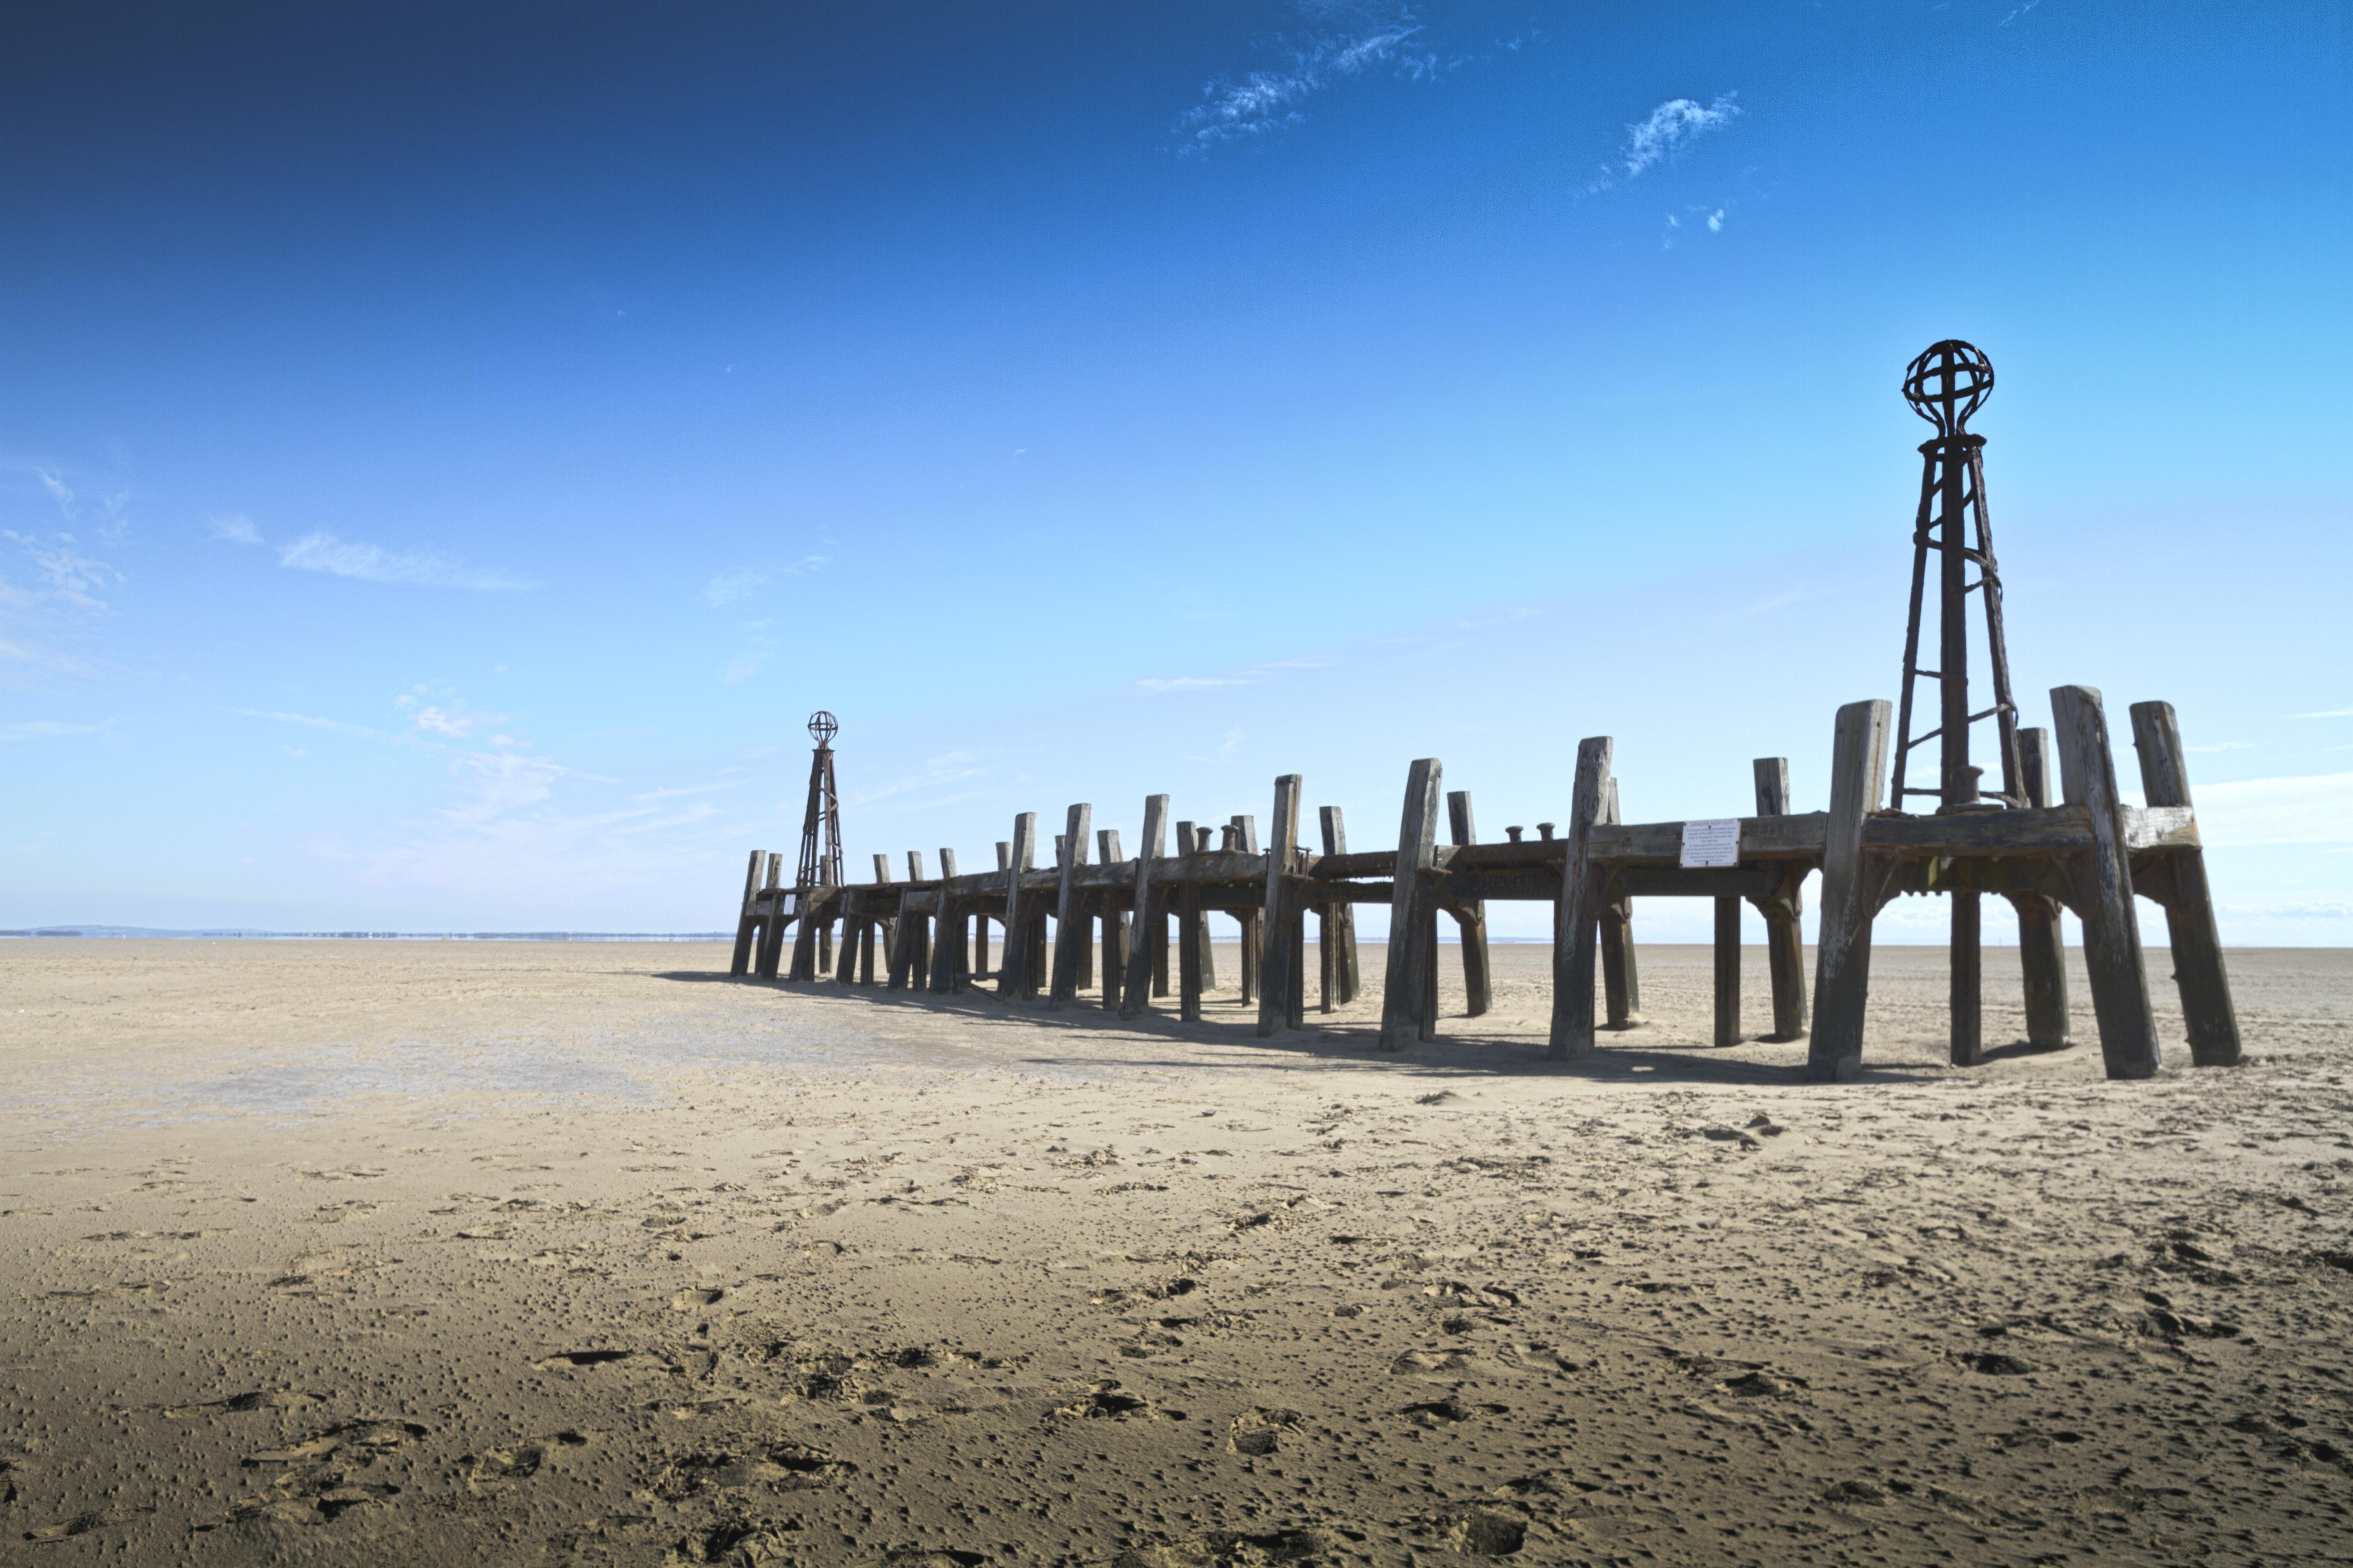 photo of brown dock on shoreline